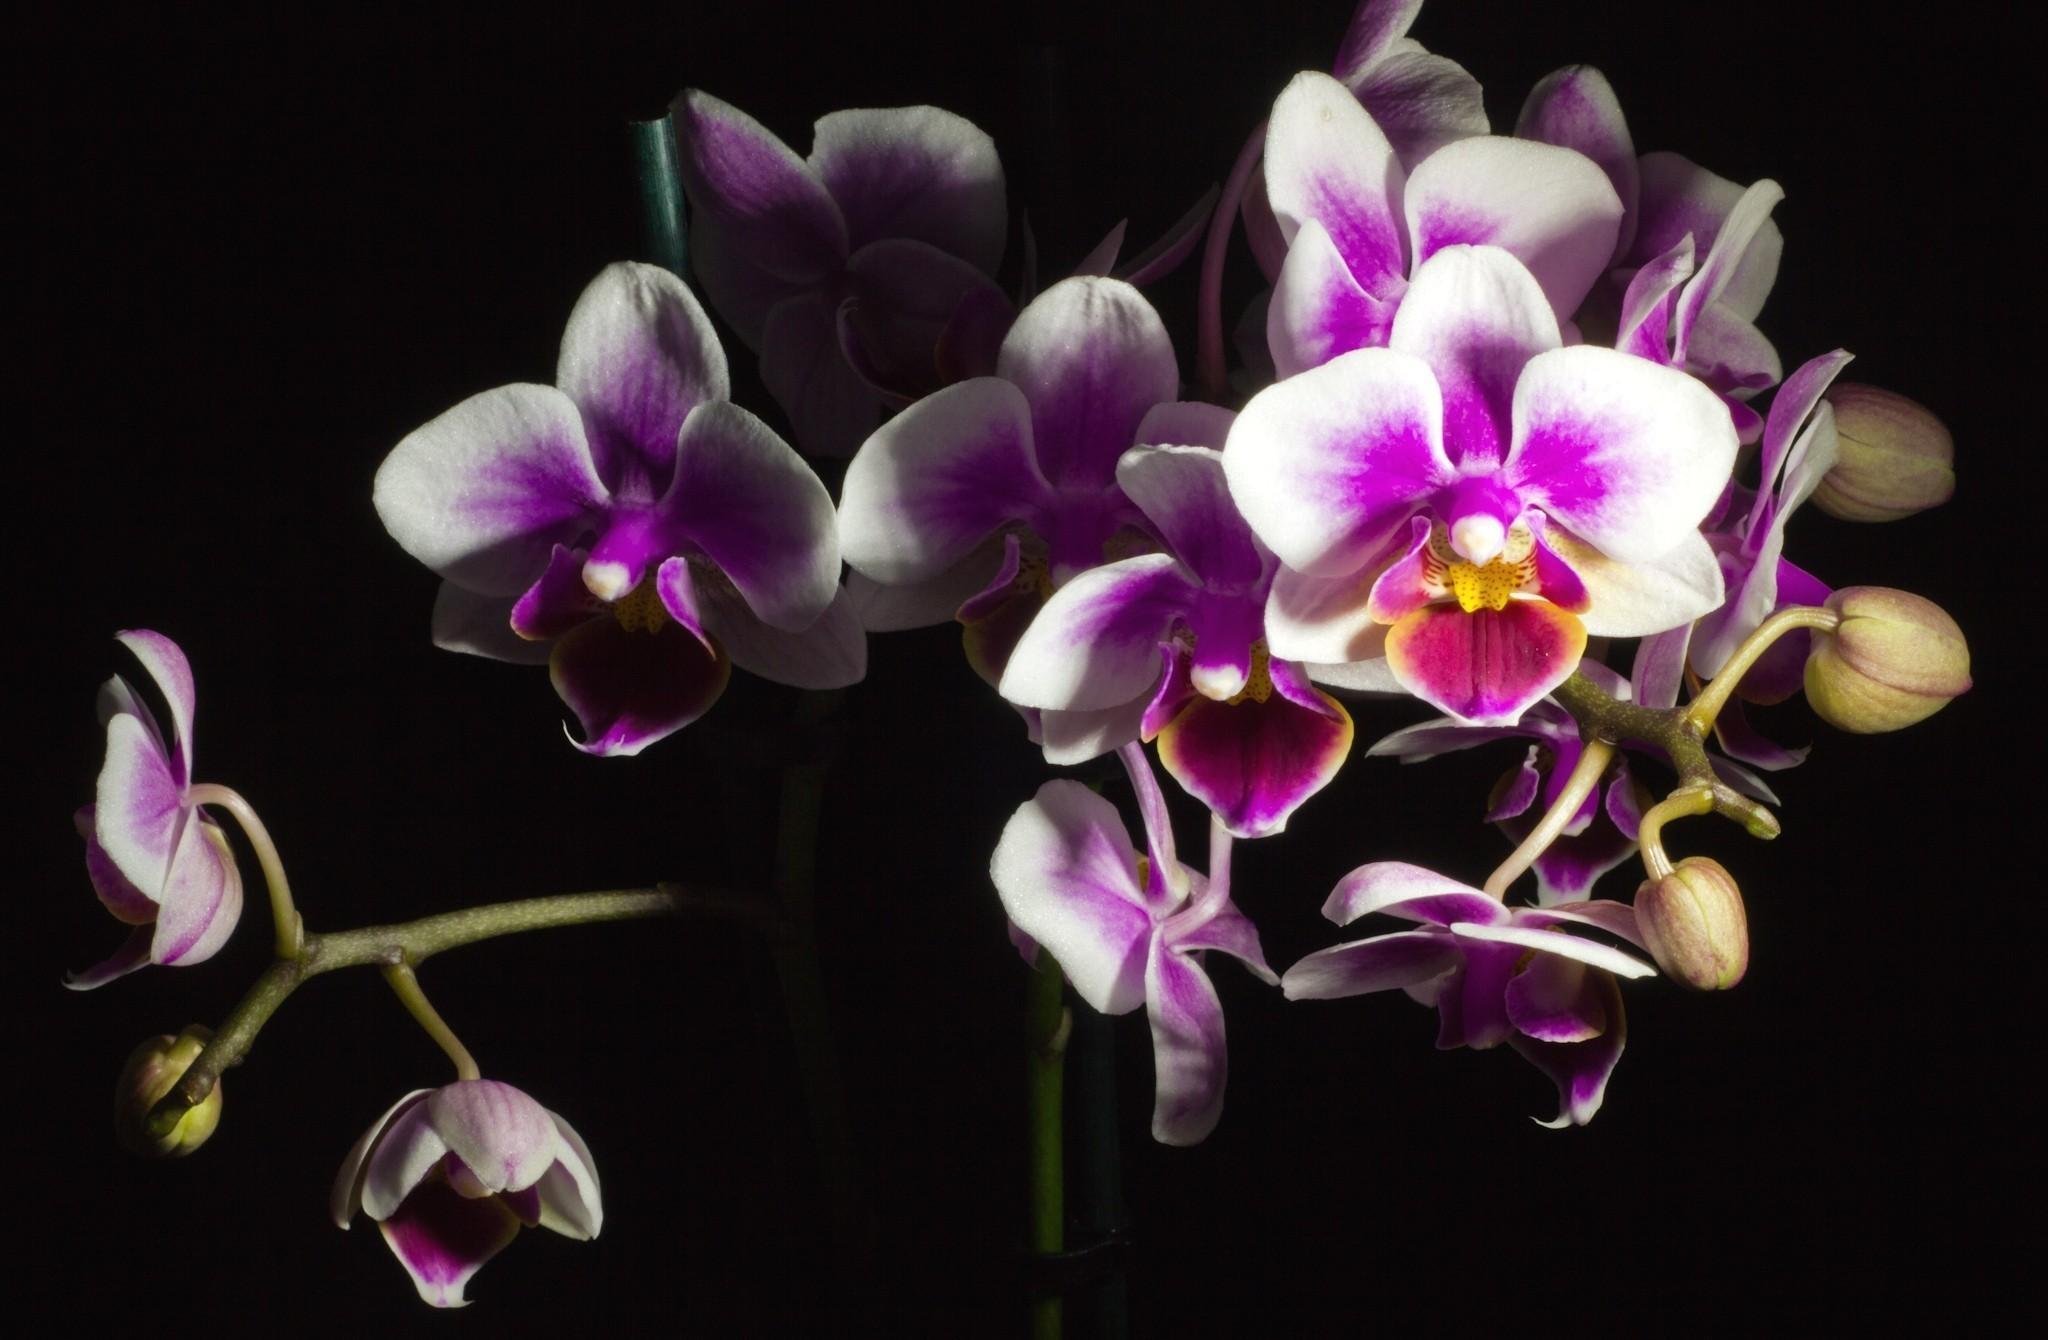 Black orchid wallpaper wallpapersafari - White orchid flowers desktop wallpapers ...